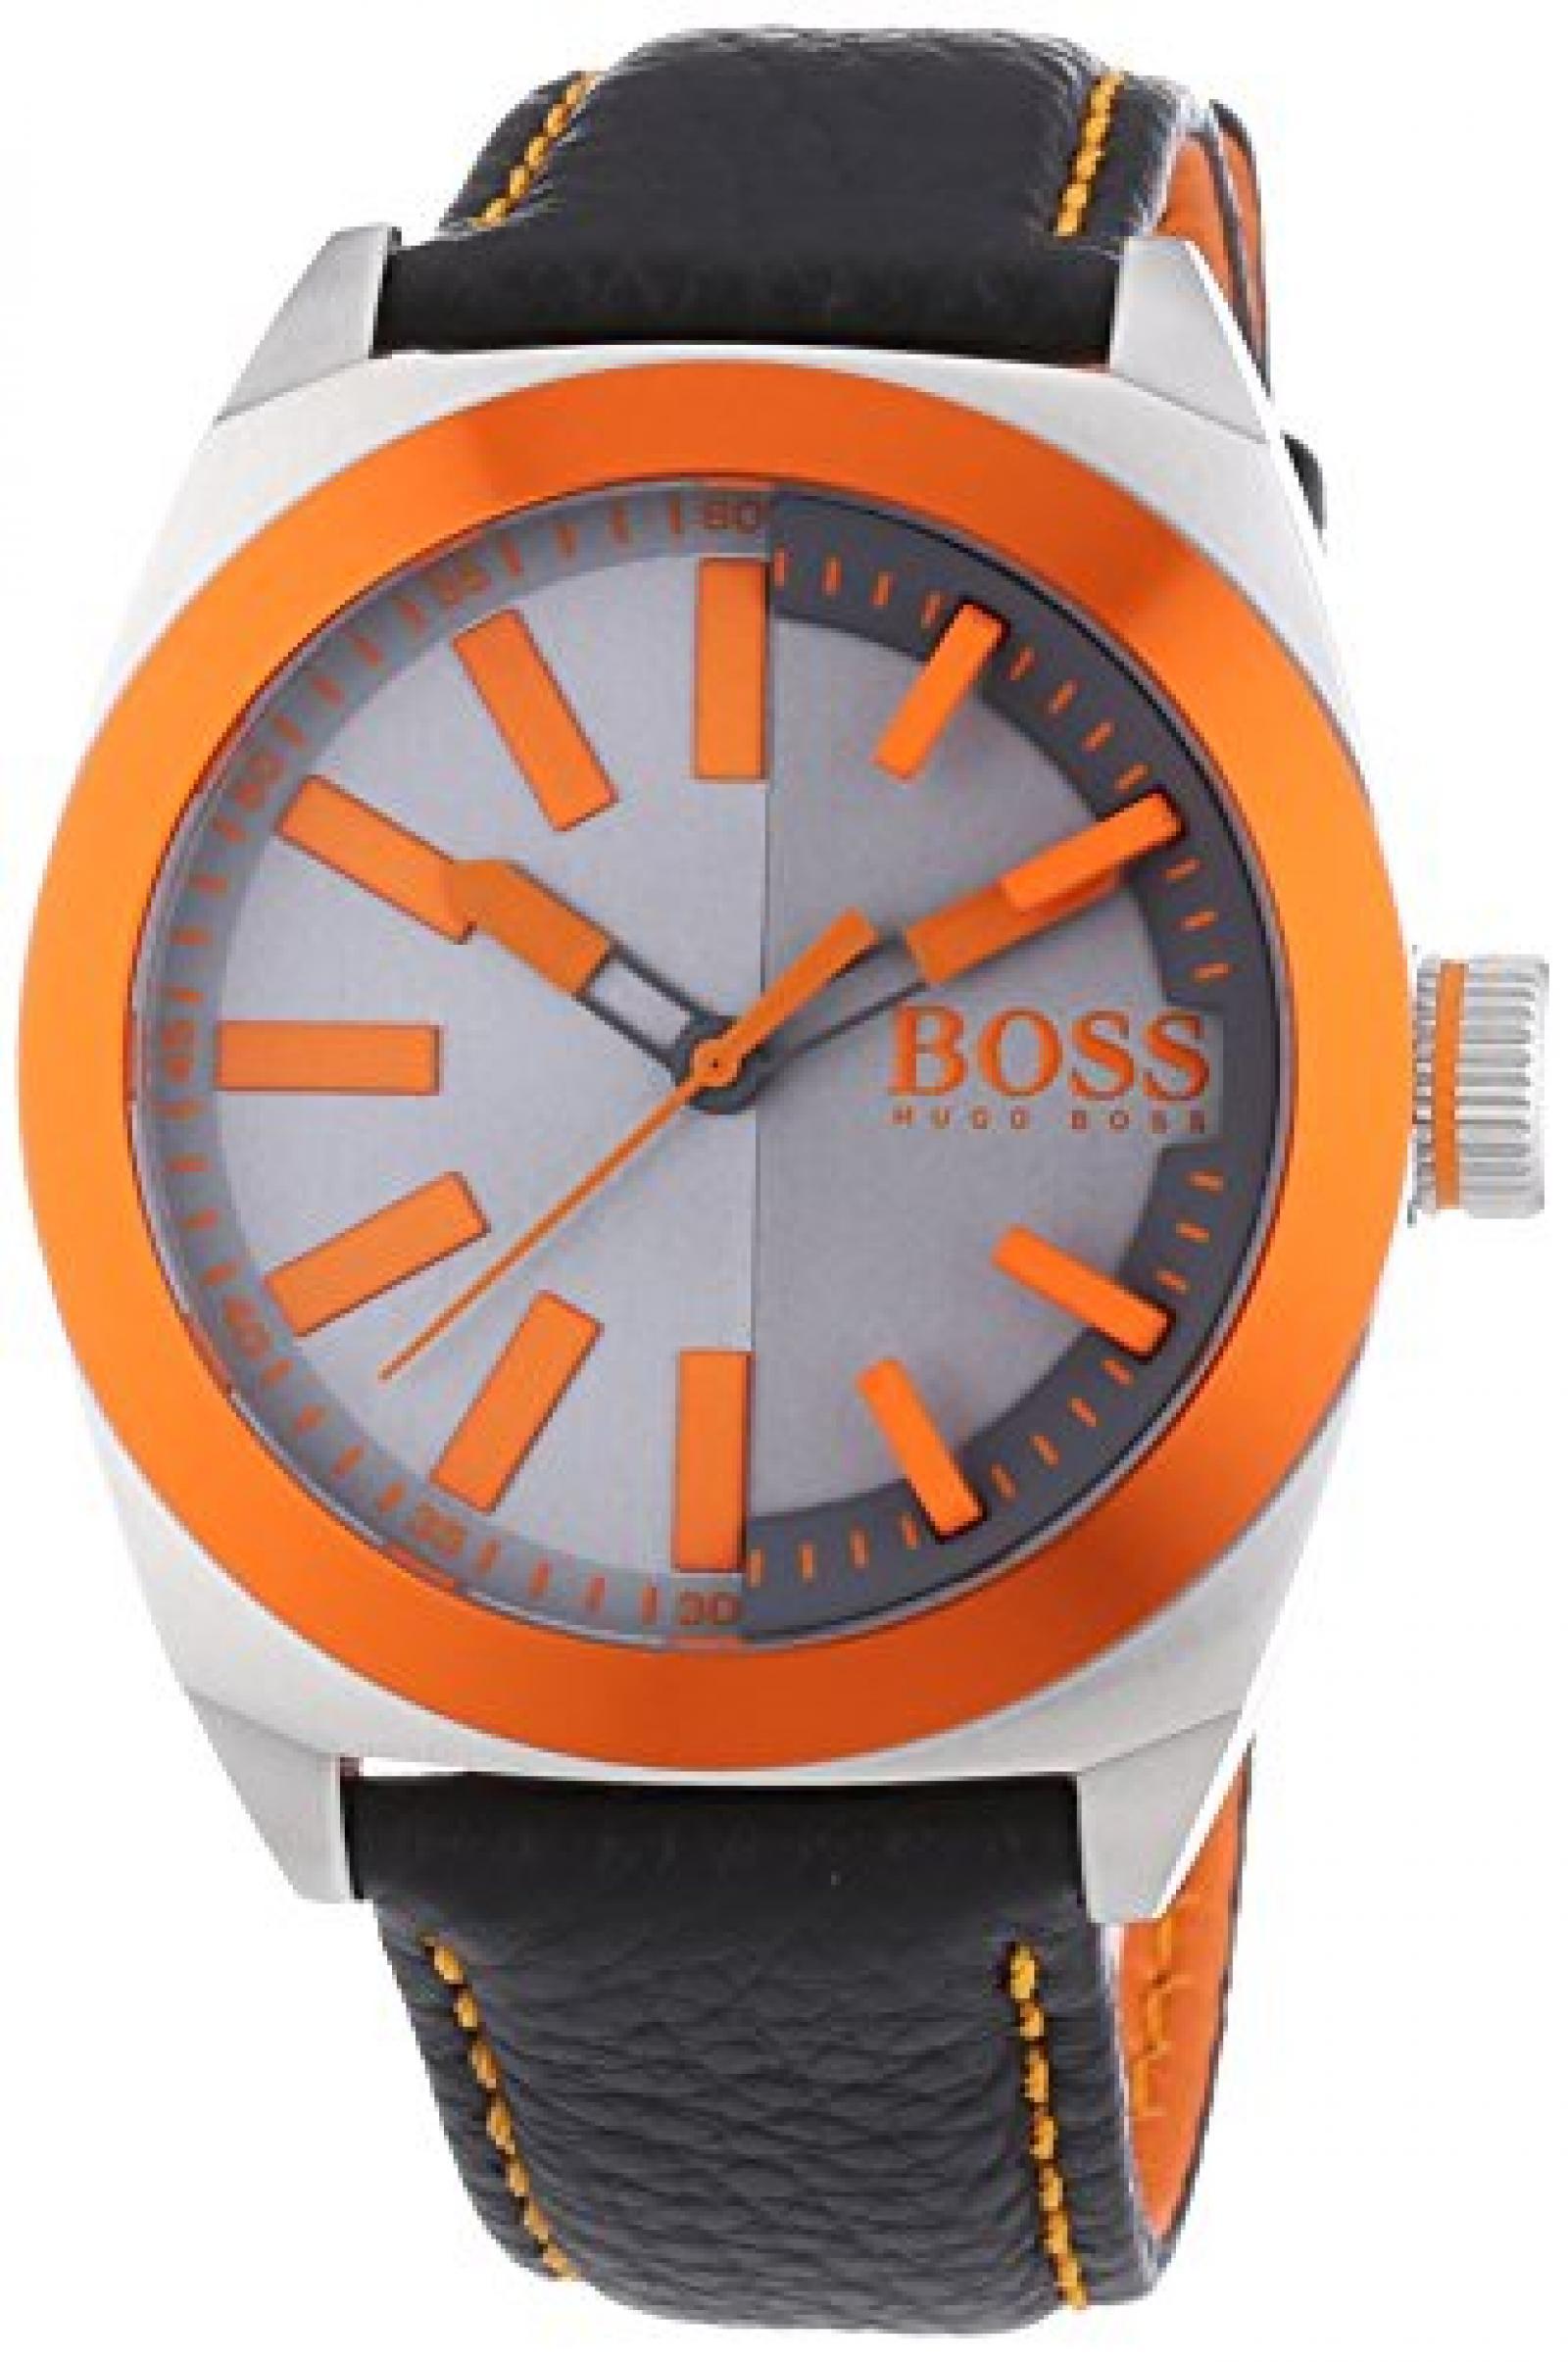 BOSS Orange Herren-Armbanduhr XL London Analog Quarz Leder 1513056